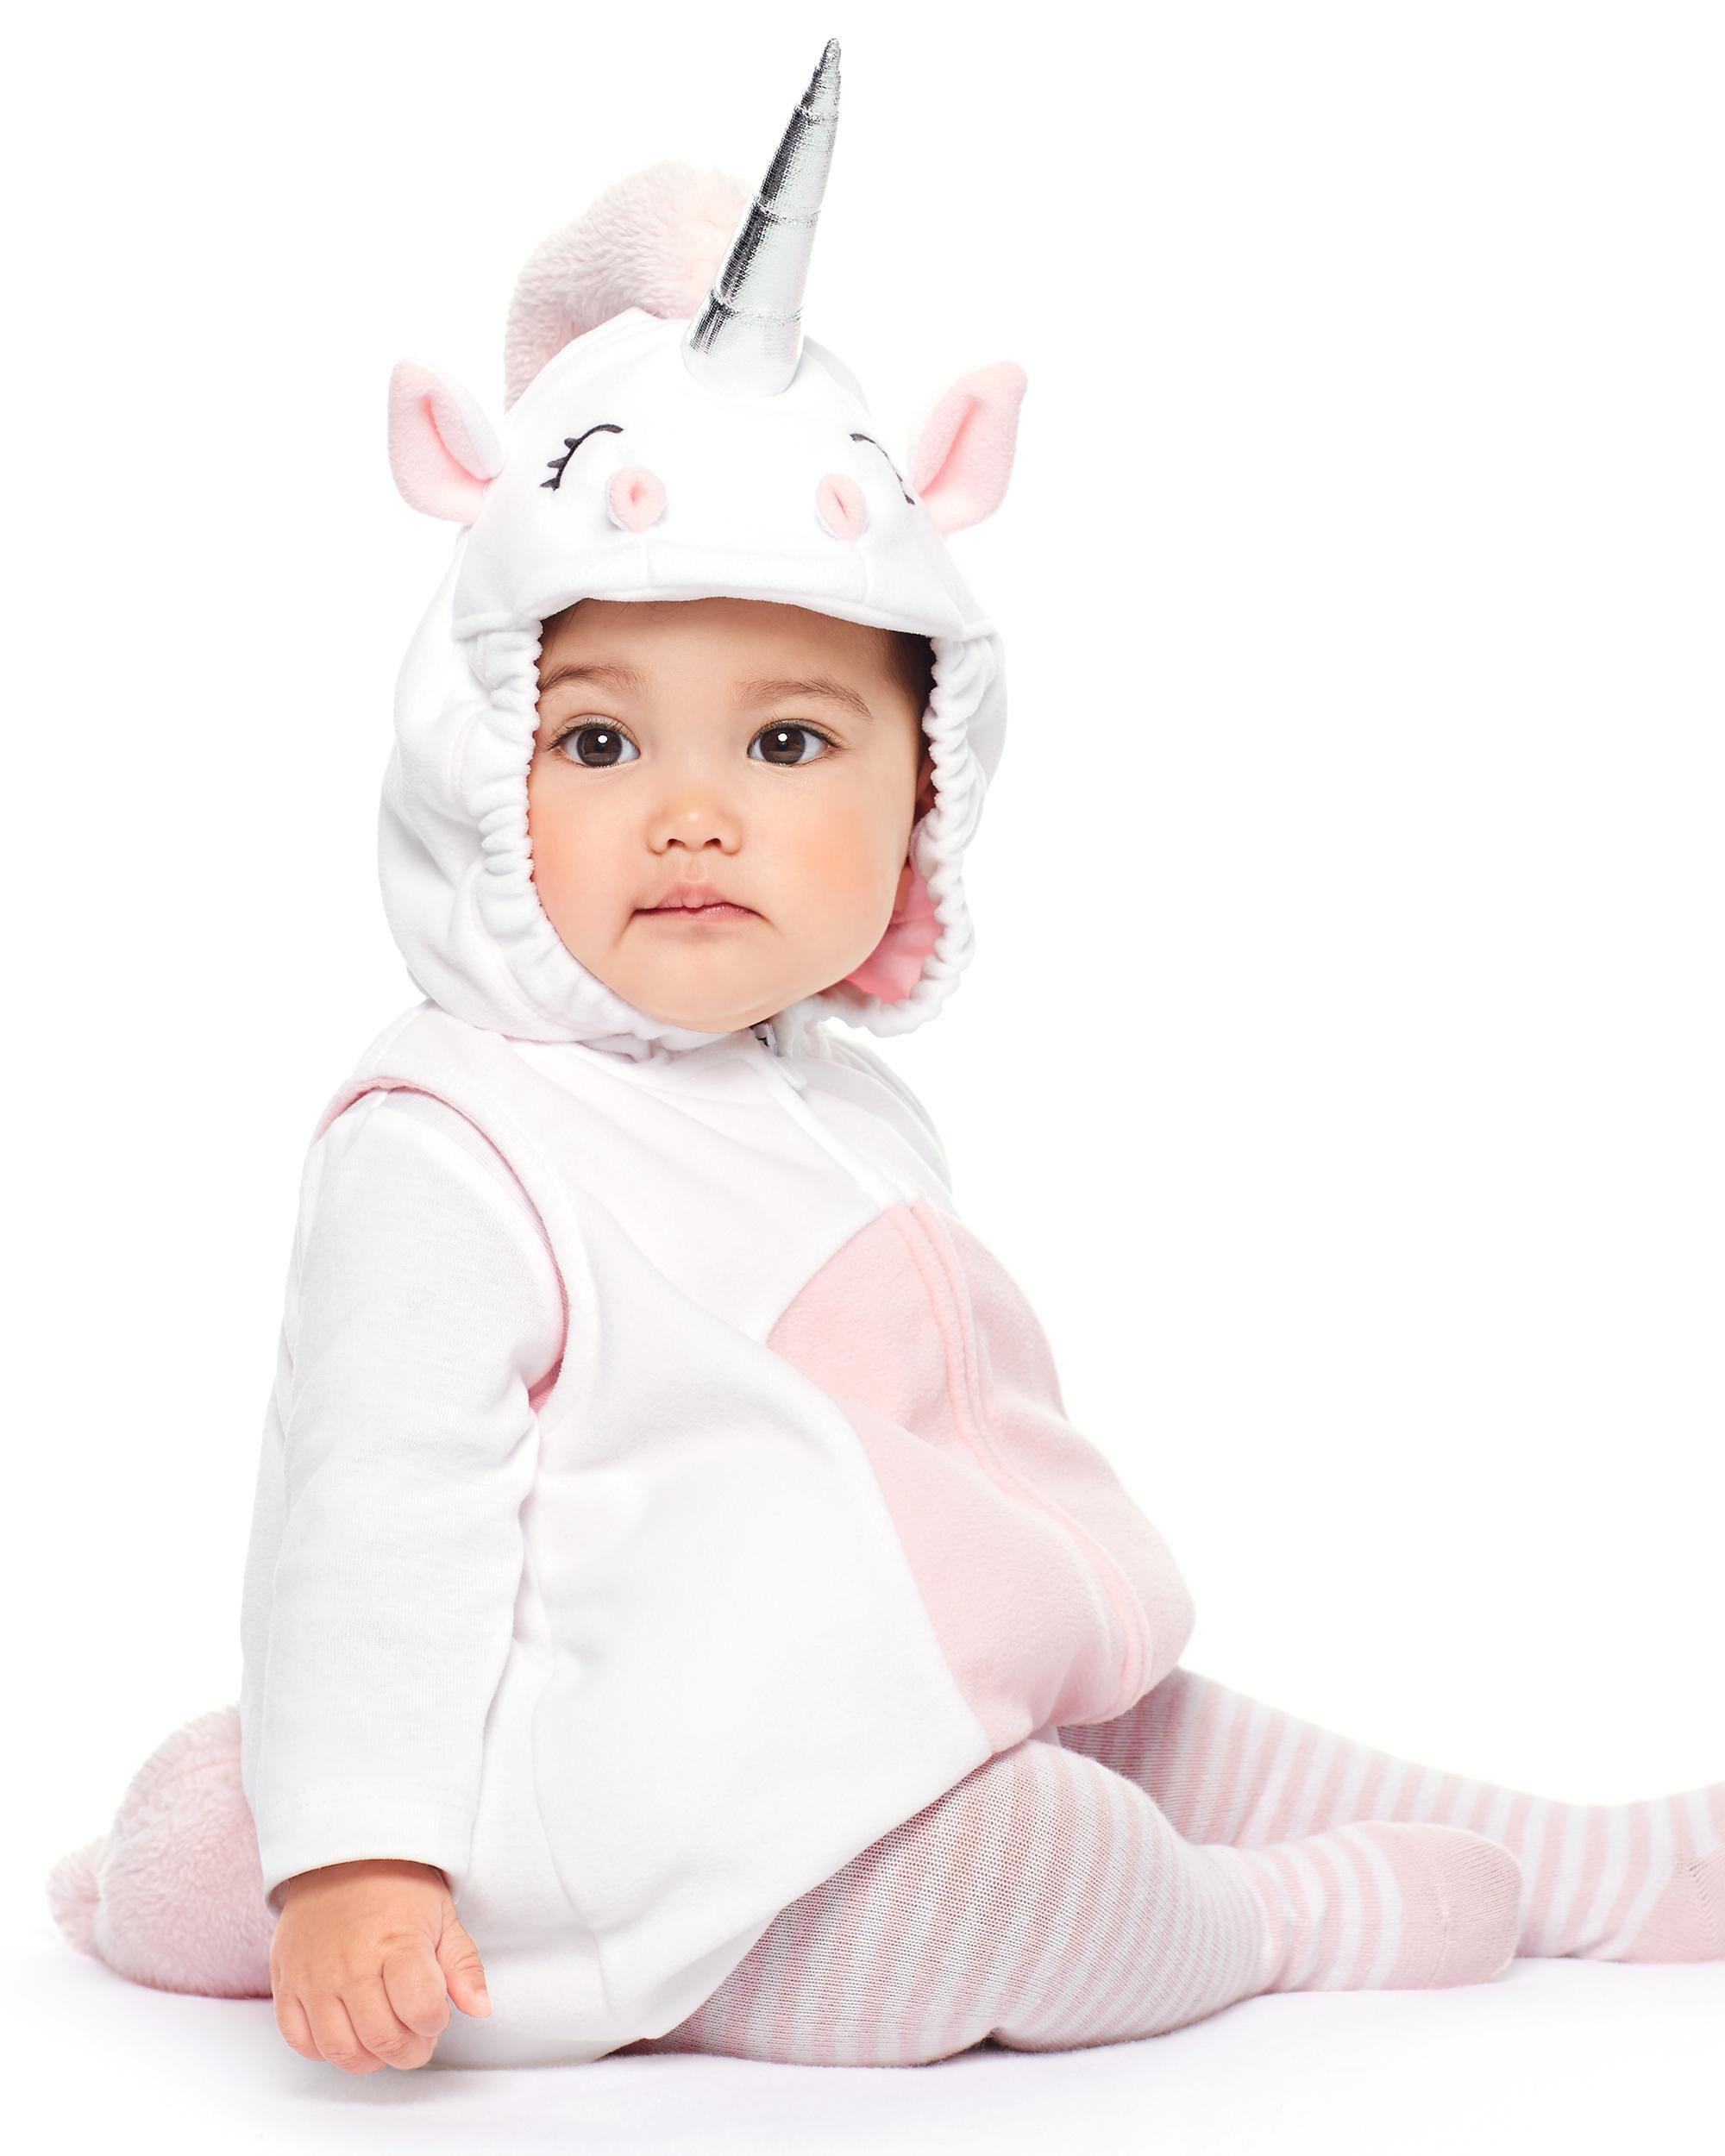 Little Unicorn Halloween Costume  sc 1 st  Carteru0027s & Baby Girl Halloween Costumes | Carters.com